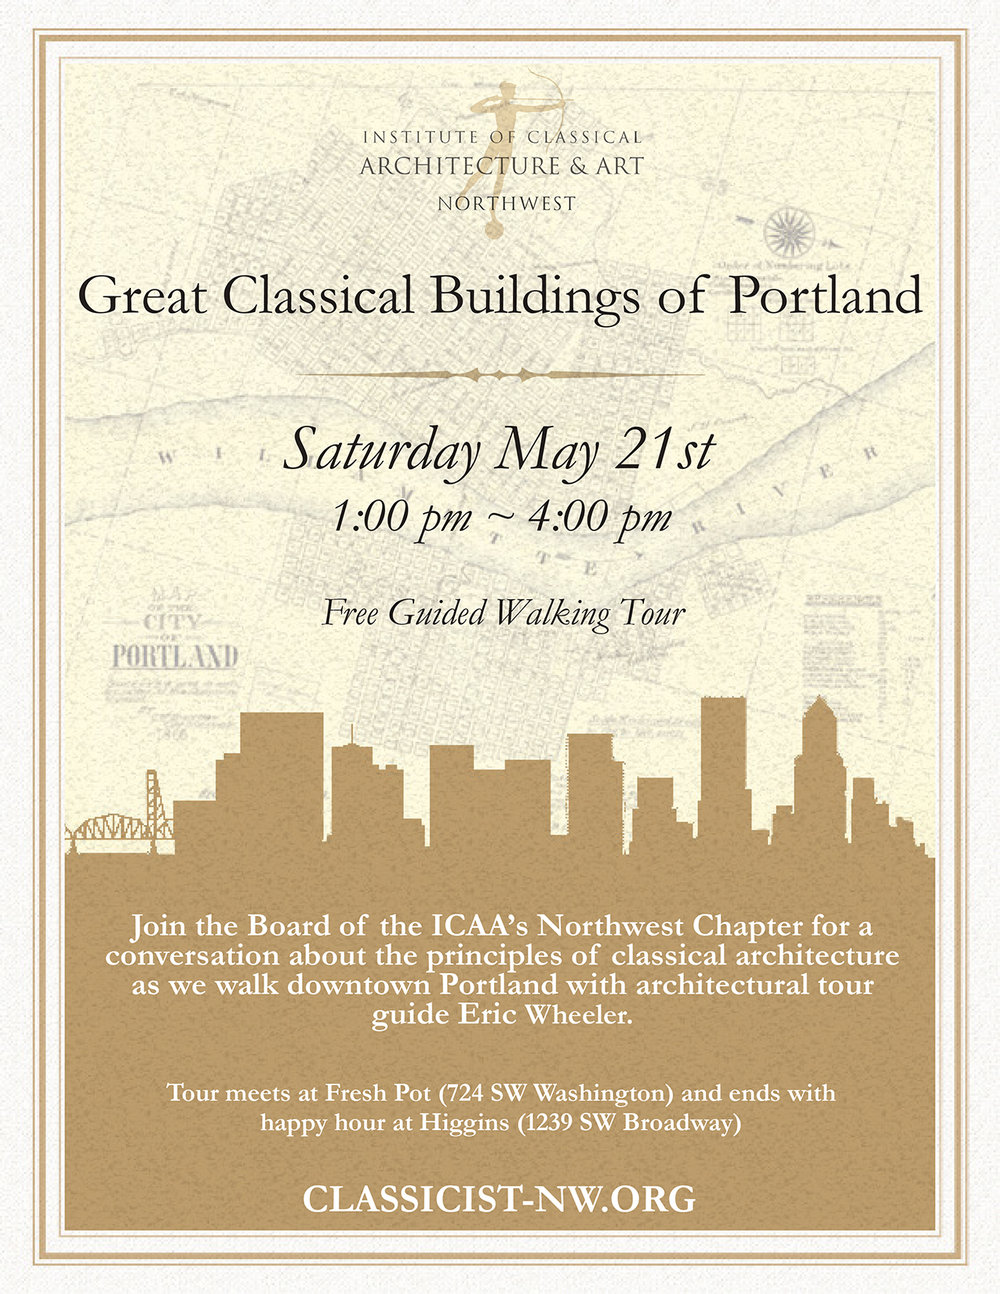 ICAA NW Chapter_Portland Tour Draft_4-17-16.jpg